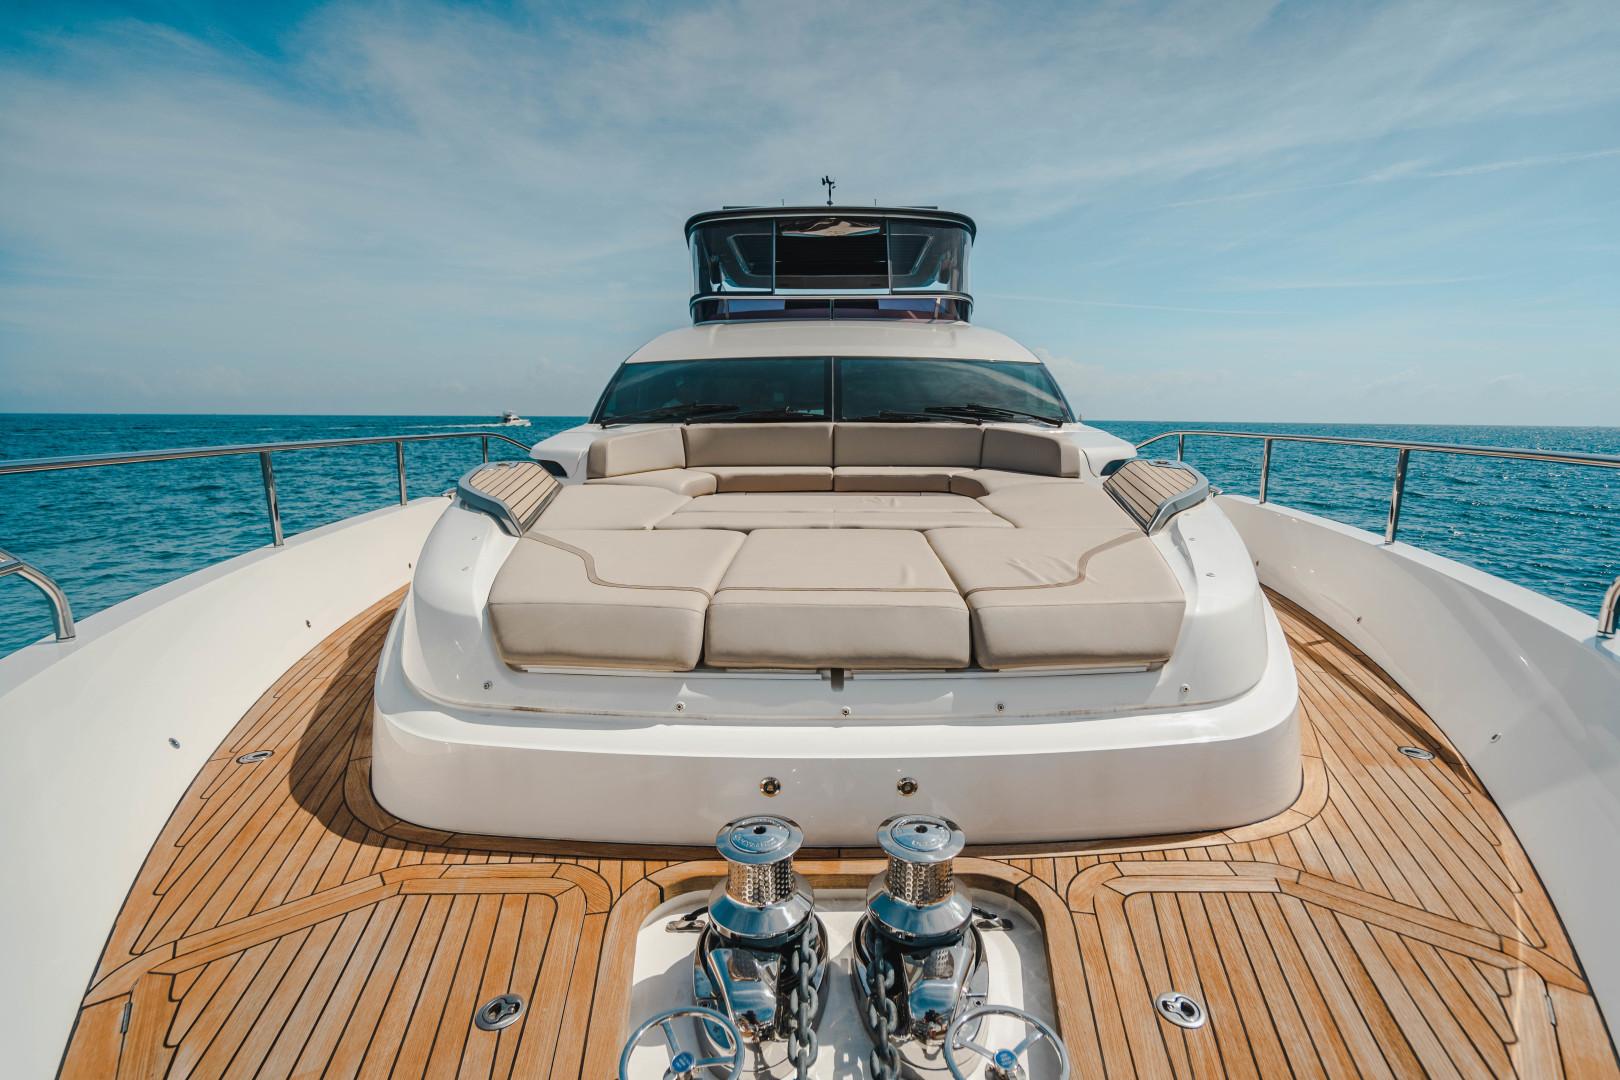 Princess-Y85  2019-Splash Delray Beach-Florida-United States-1631622 | Thumbnail